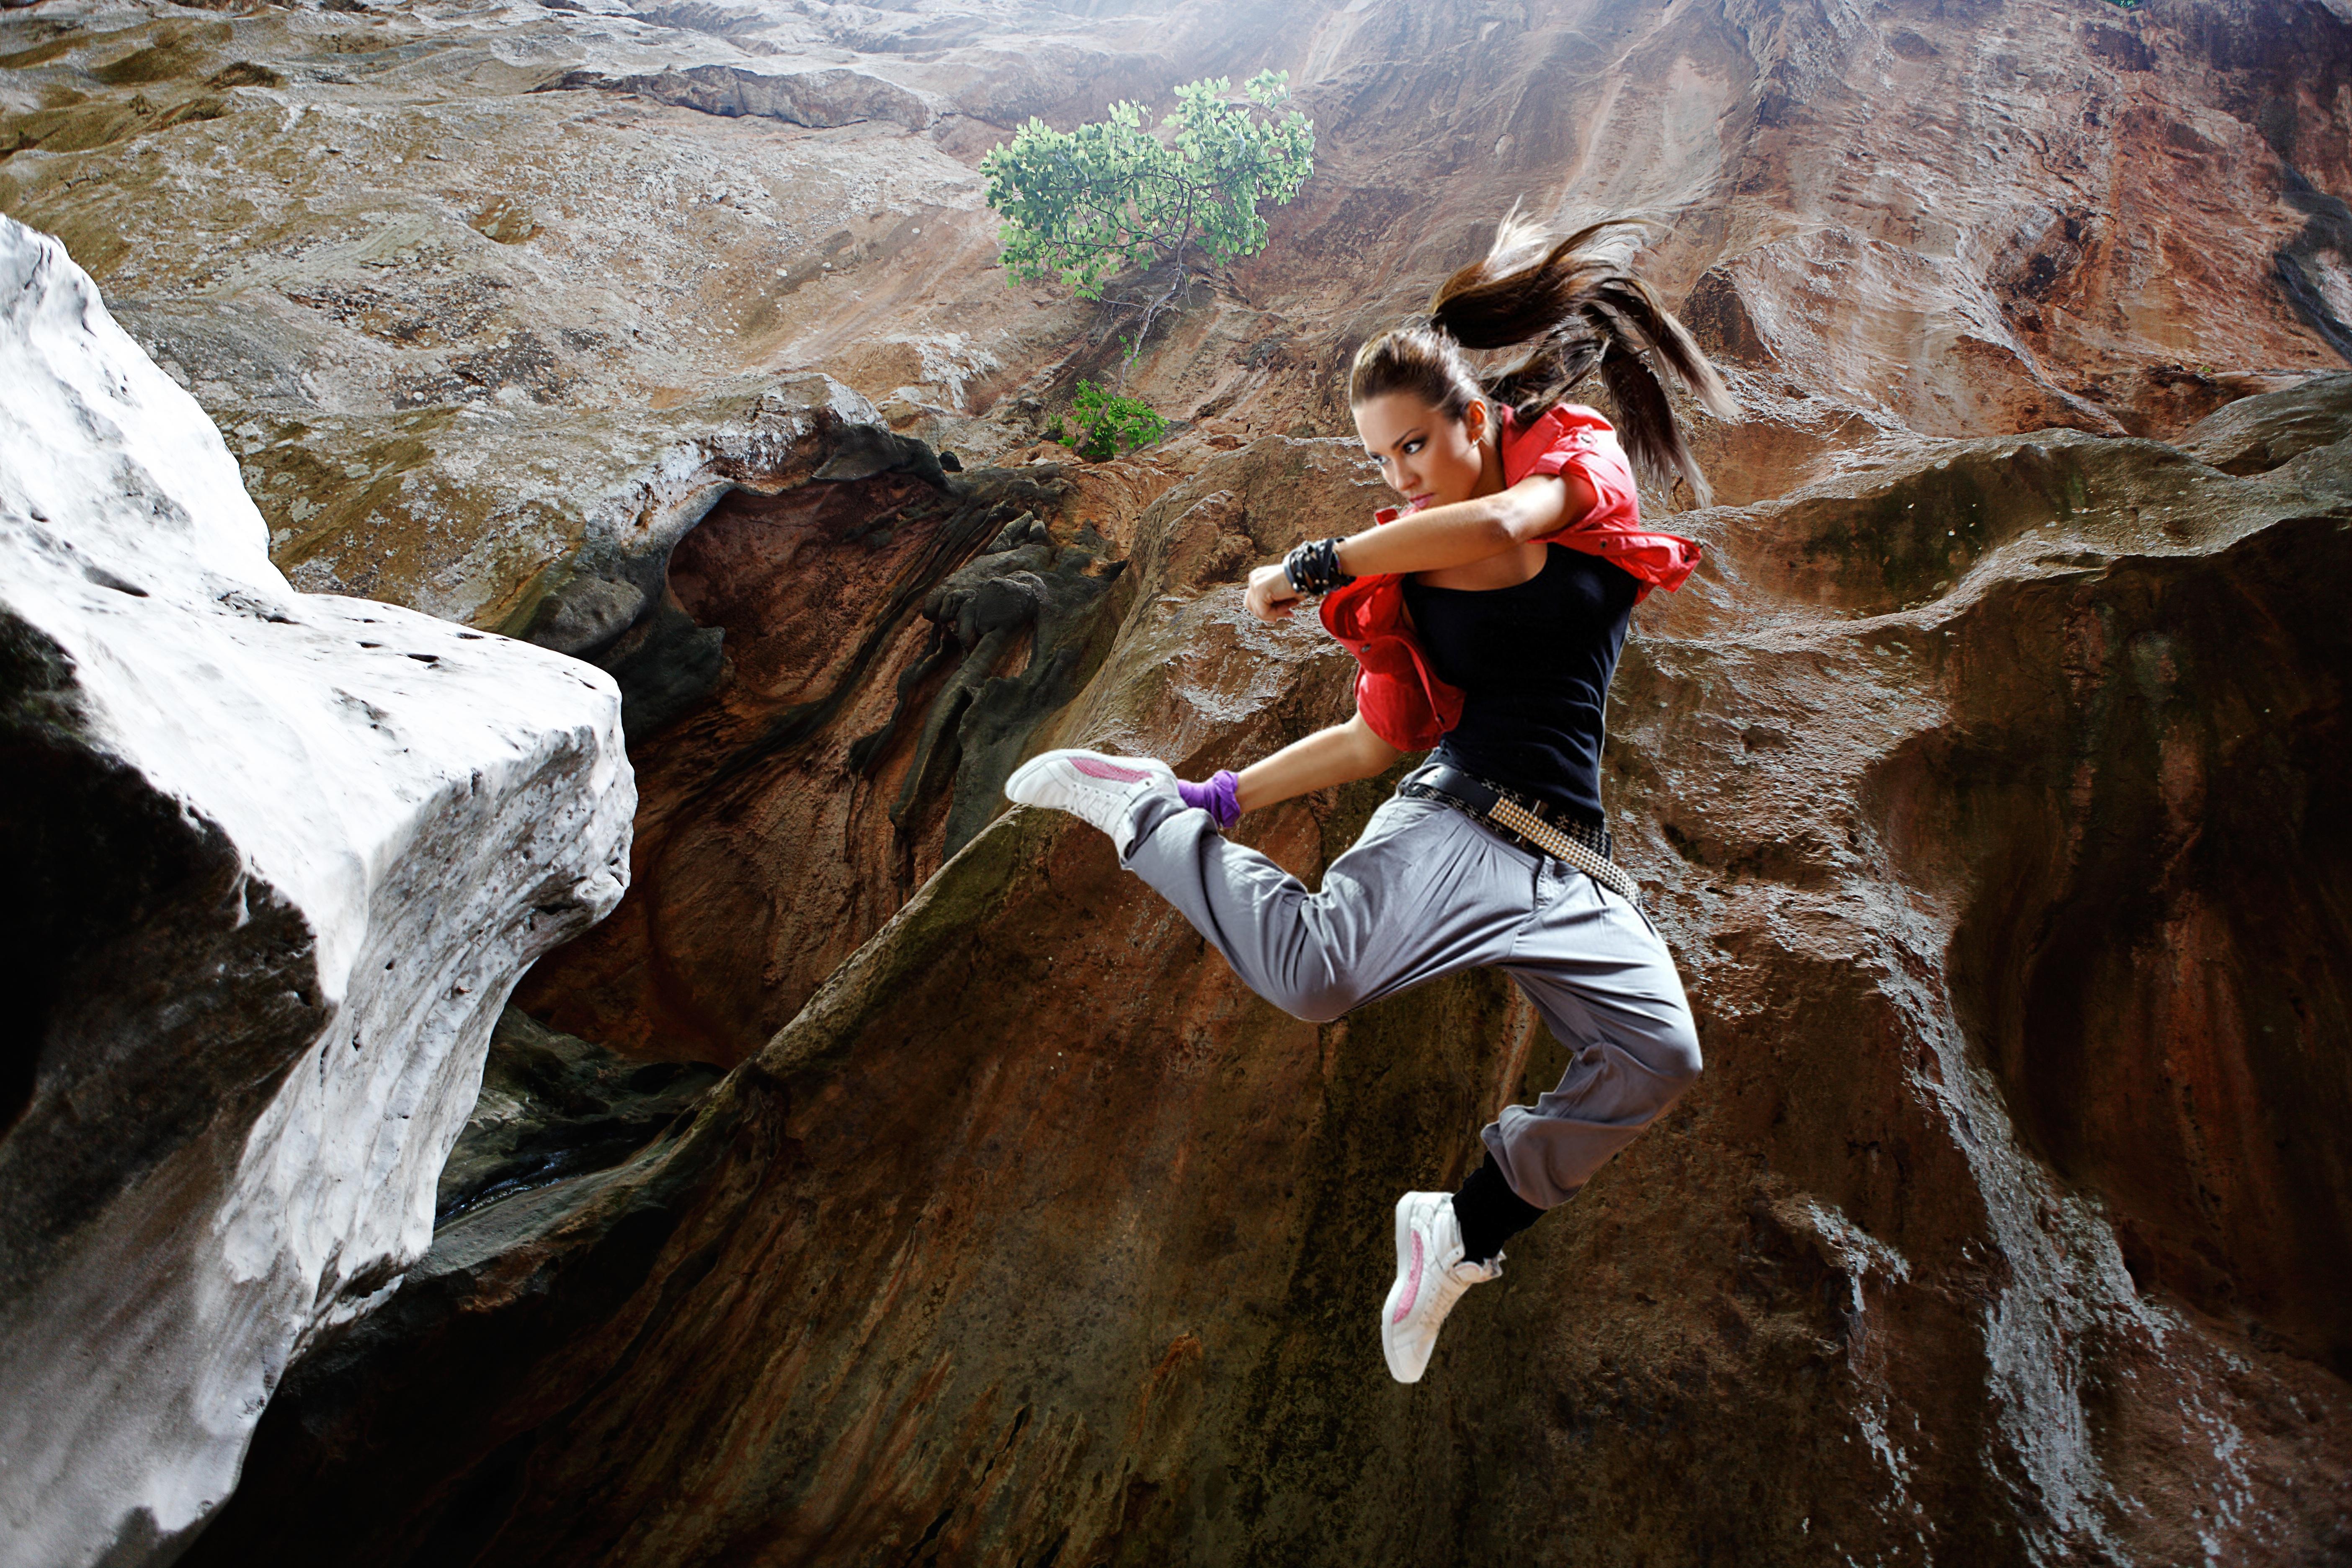 Escalada Saltando Saltar Mujer Rock Roca Alpinismo Aventuras Piedra Garganta Deporte Acantilado Fotos De Zapatilla Niña Persona Gratis H0wwZ8q